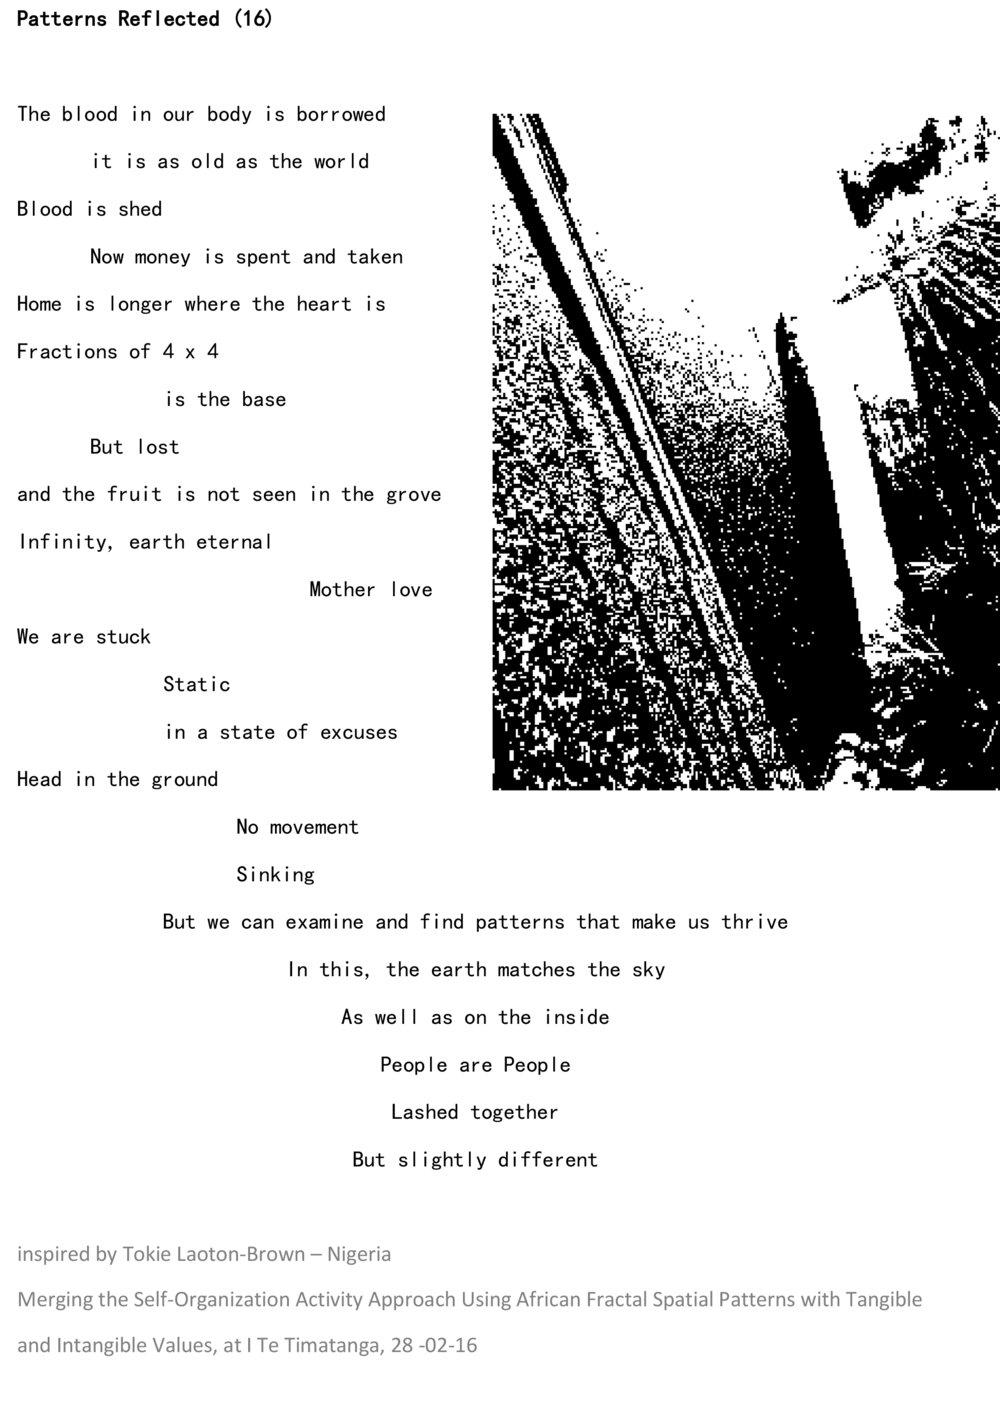 Timatanga reflections-6.jpg